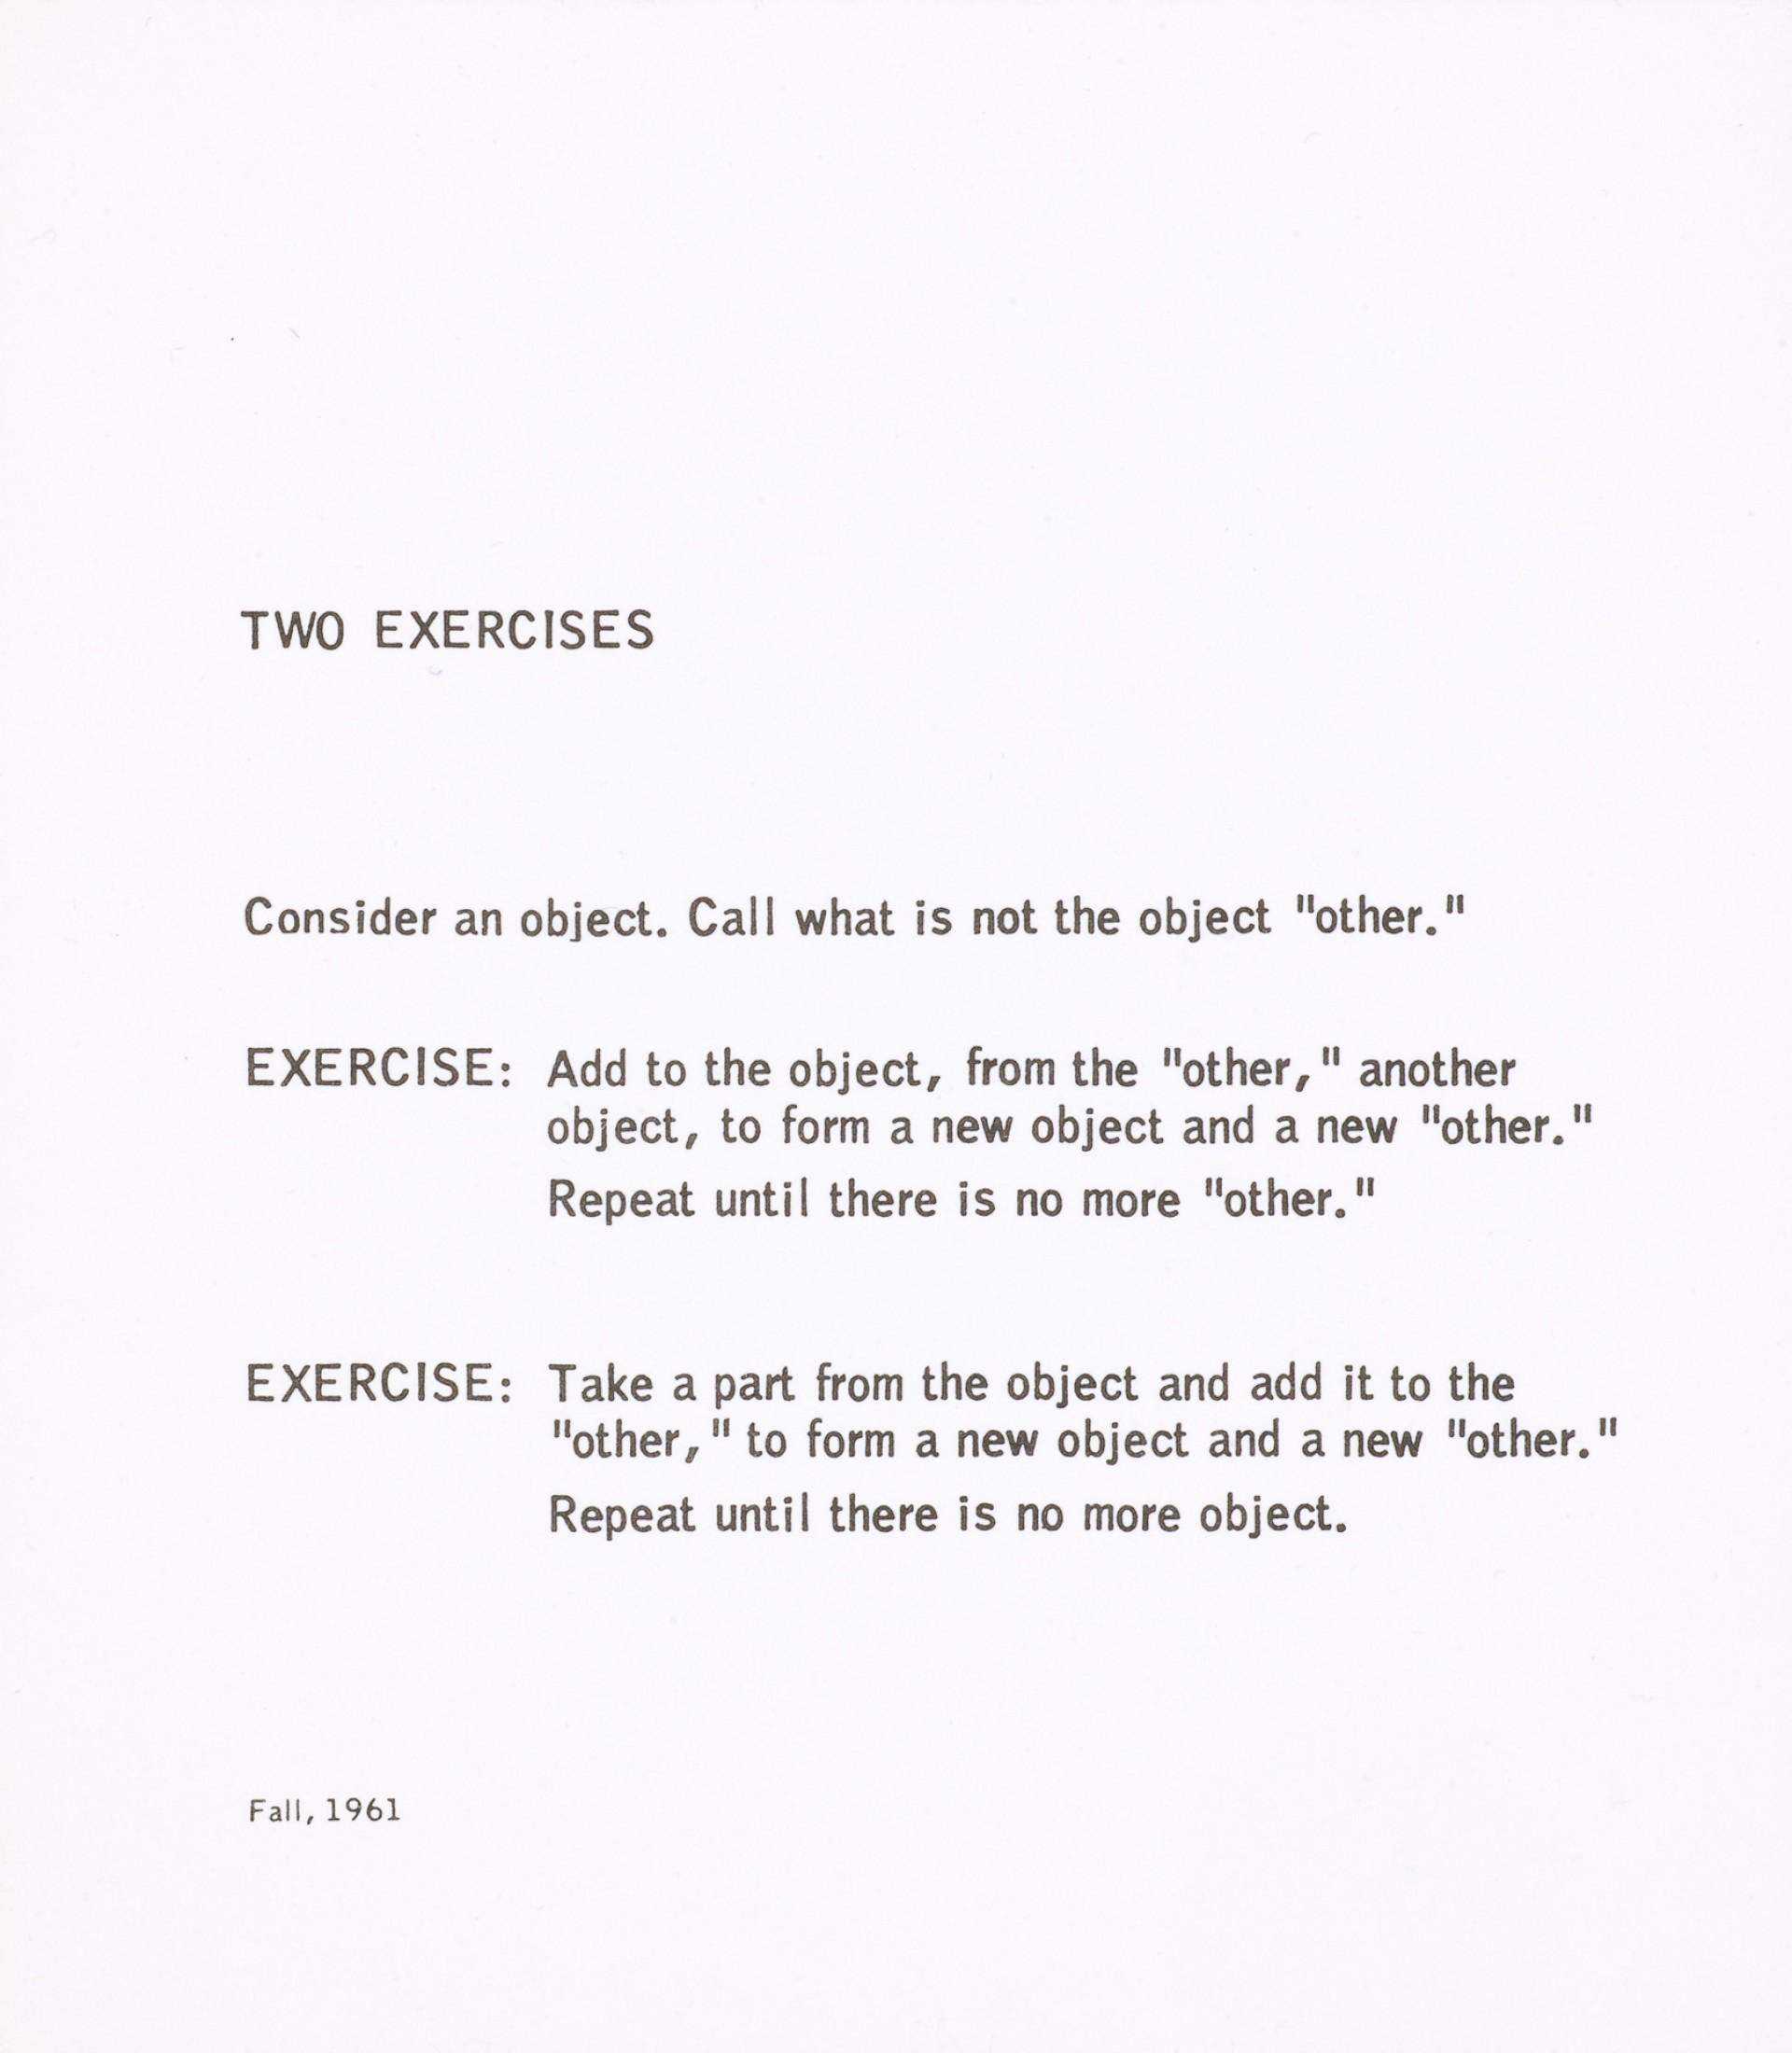 017 Lyric Essays Wac 7604 Awesome Essay Examples 1920